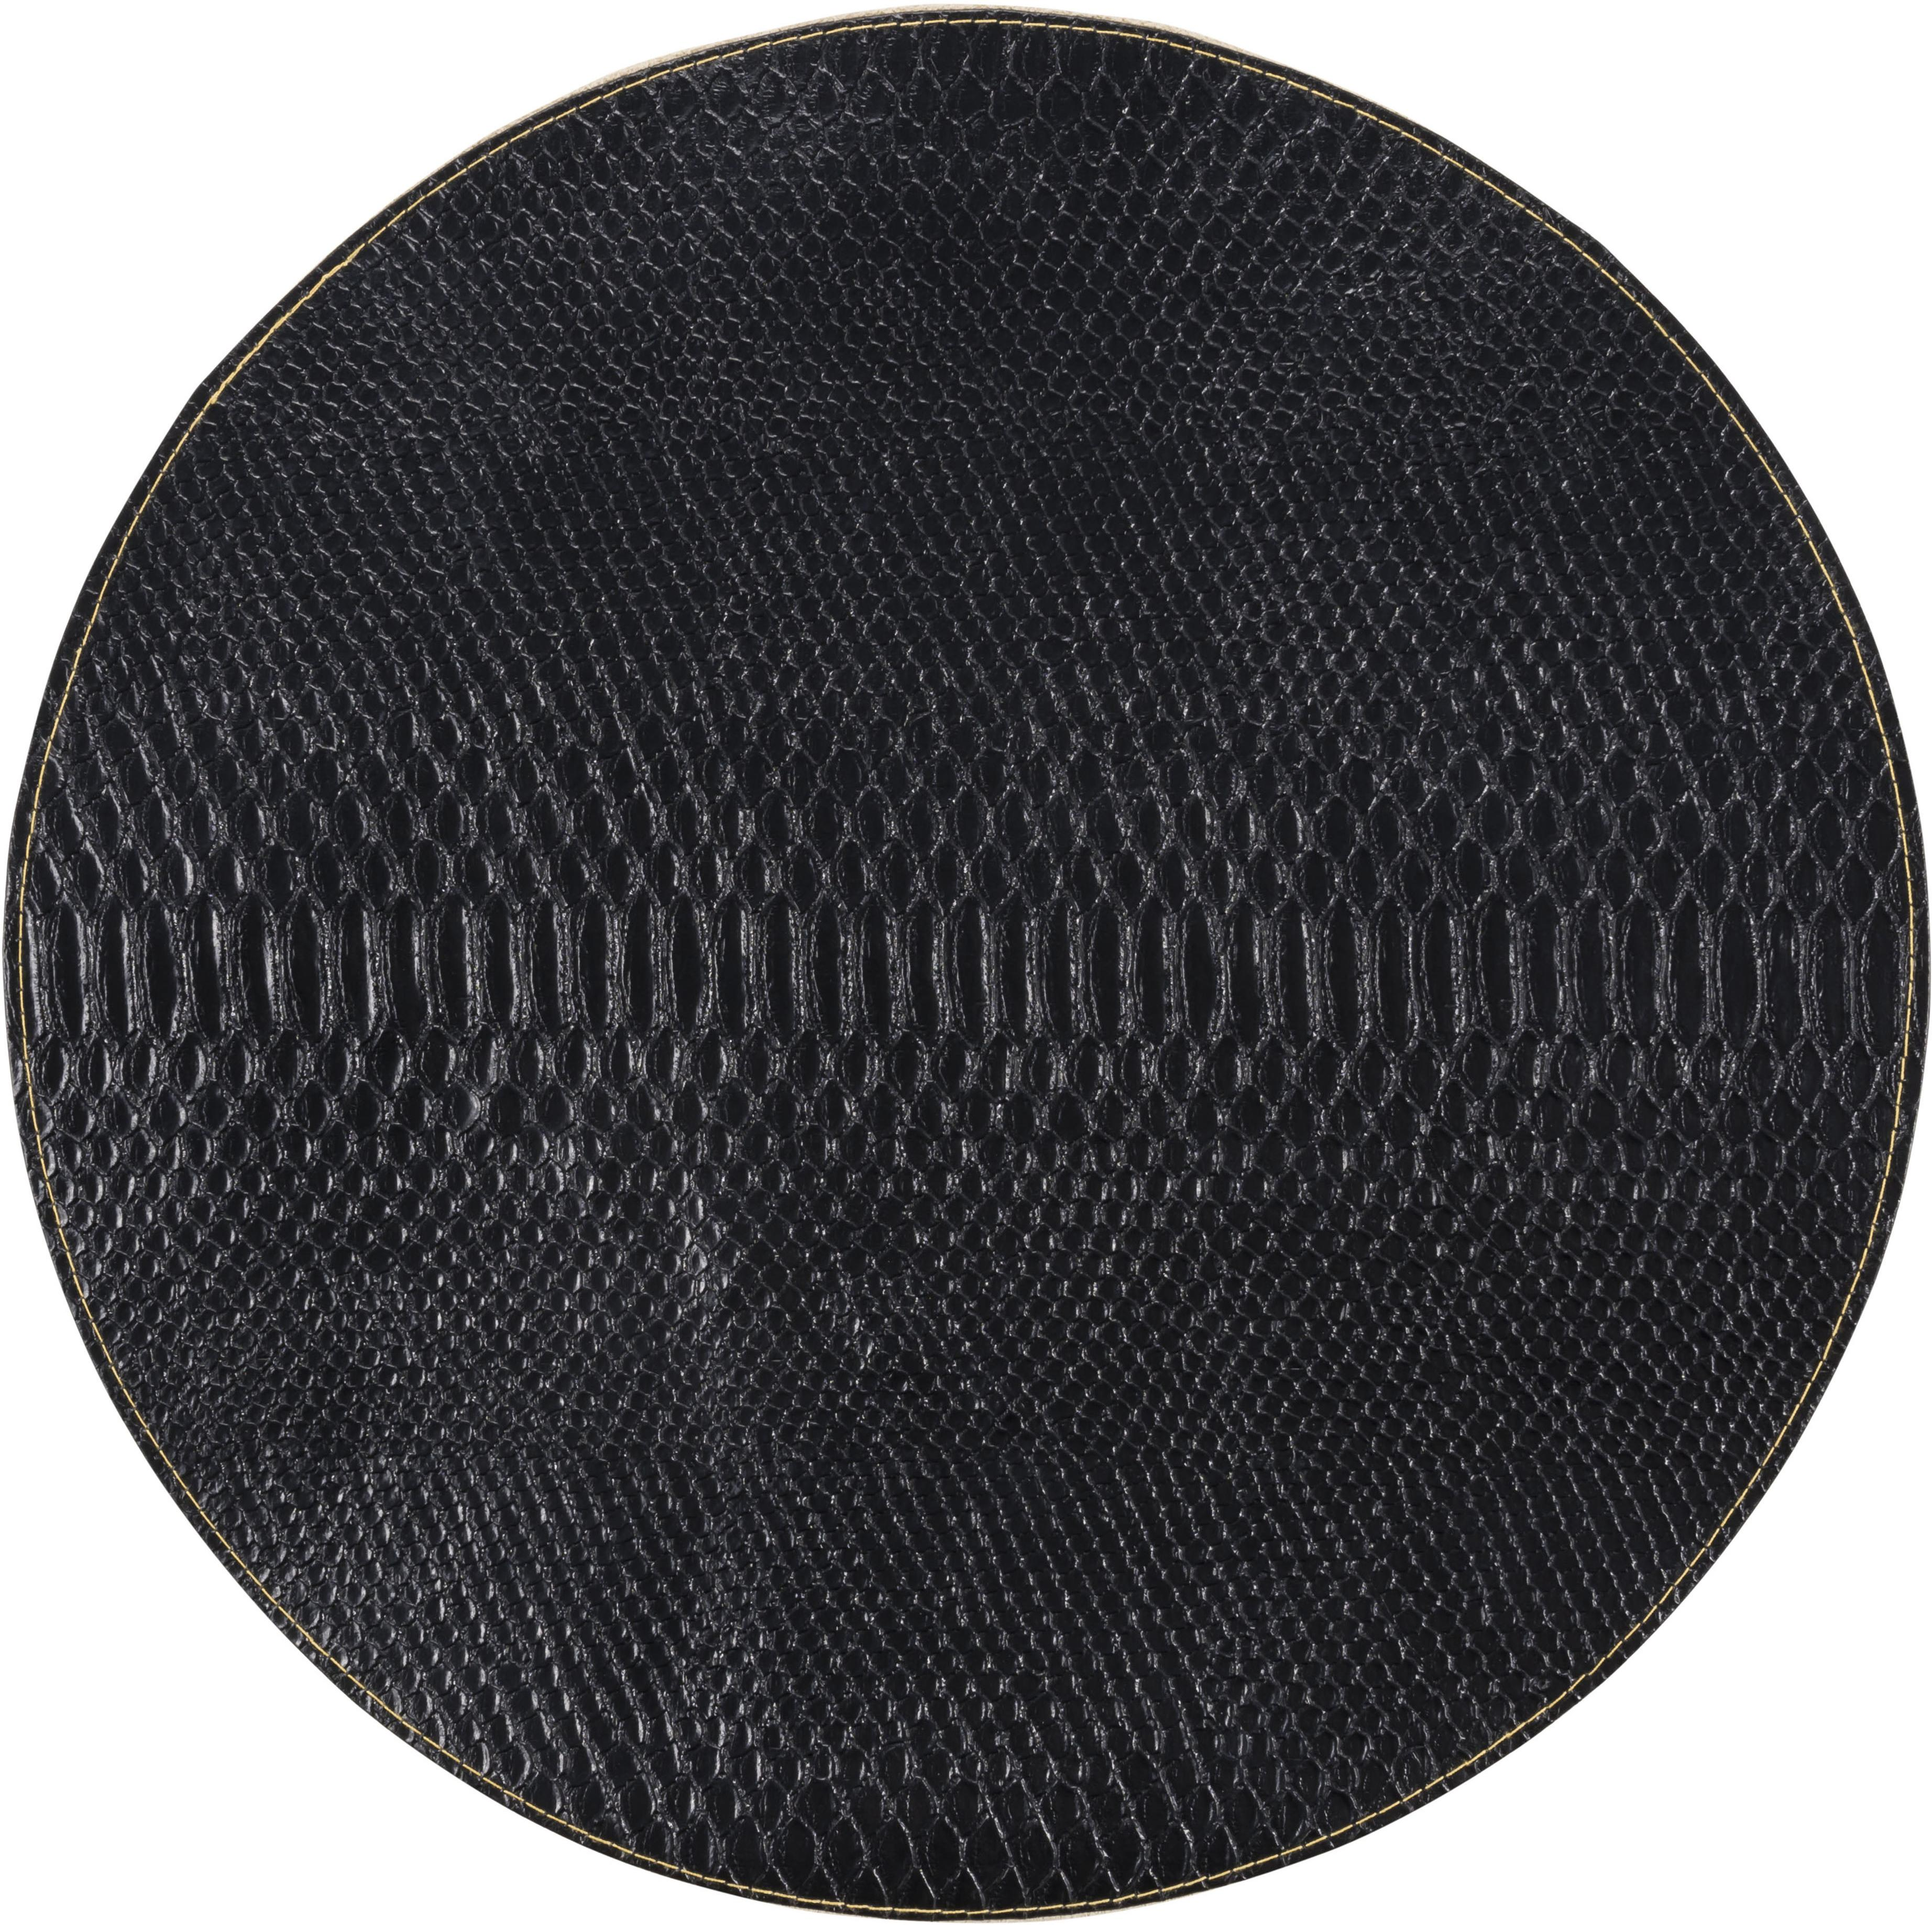 Manteles individuales redondos Allie, 2uds., Cuero sintético, Negro, dorado, Ø 38 cm